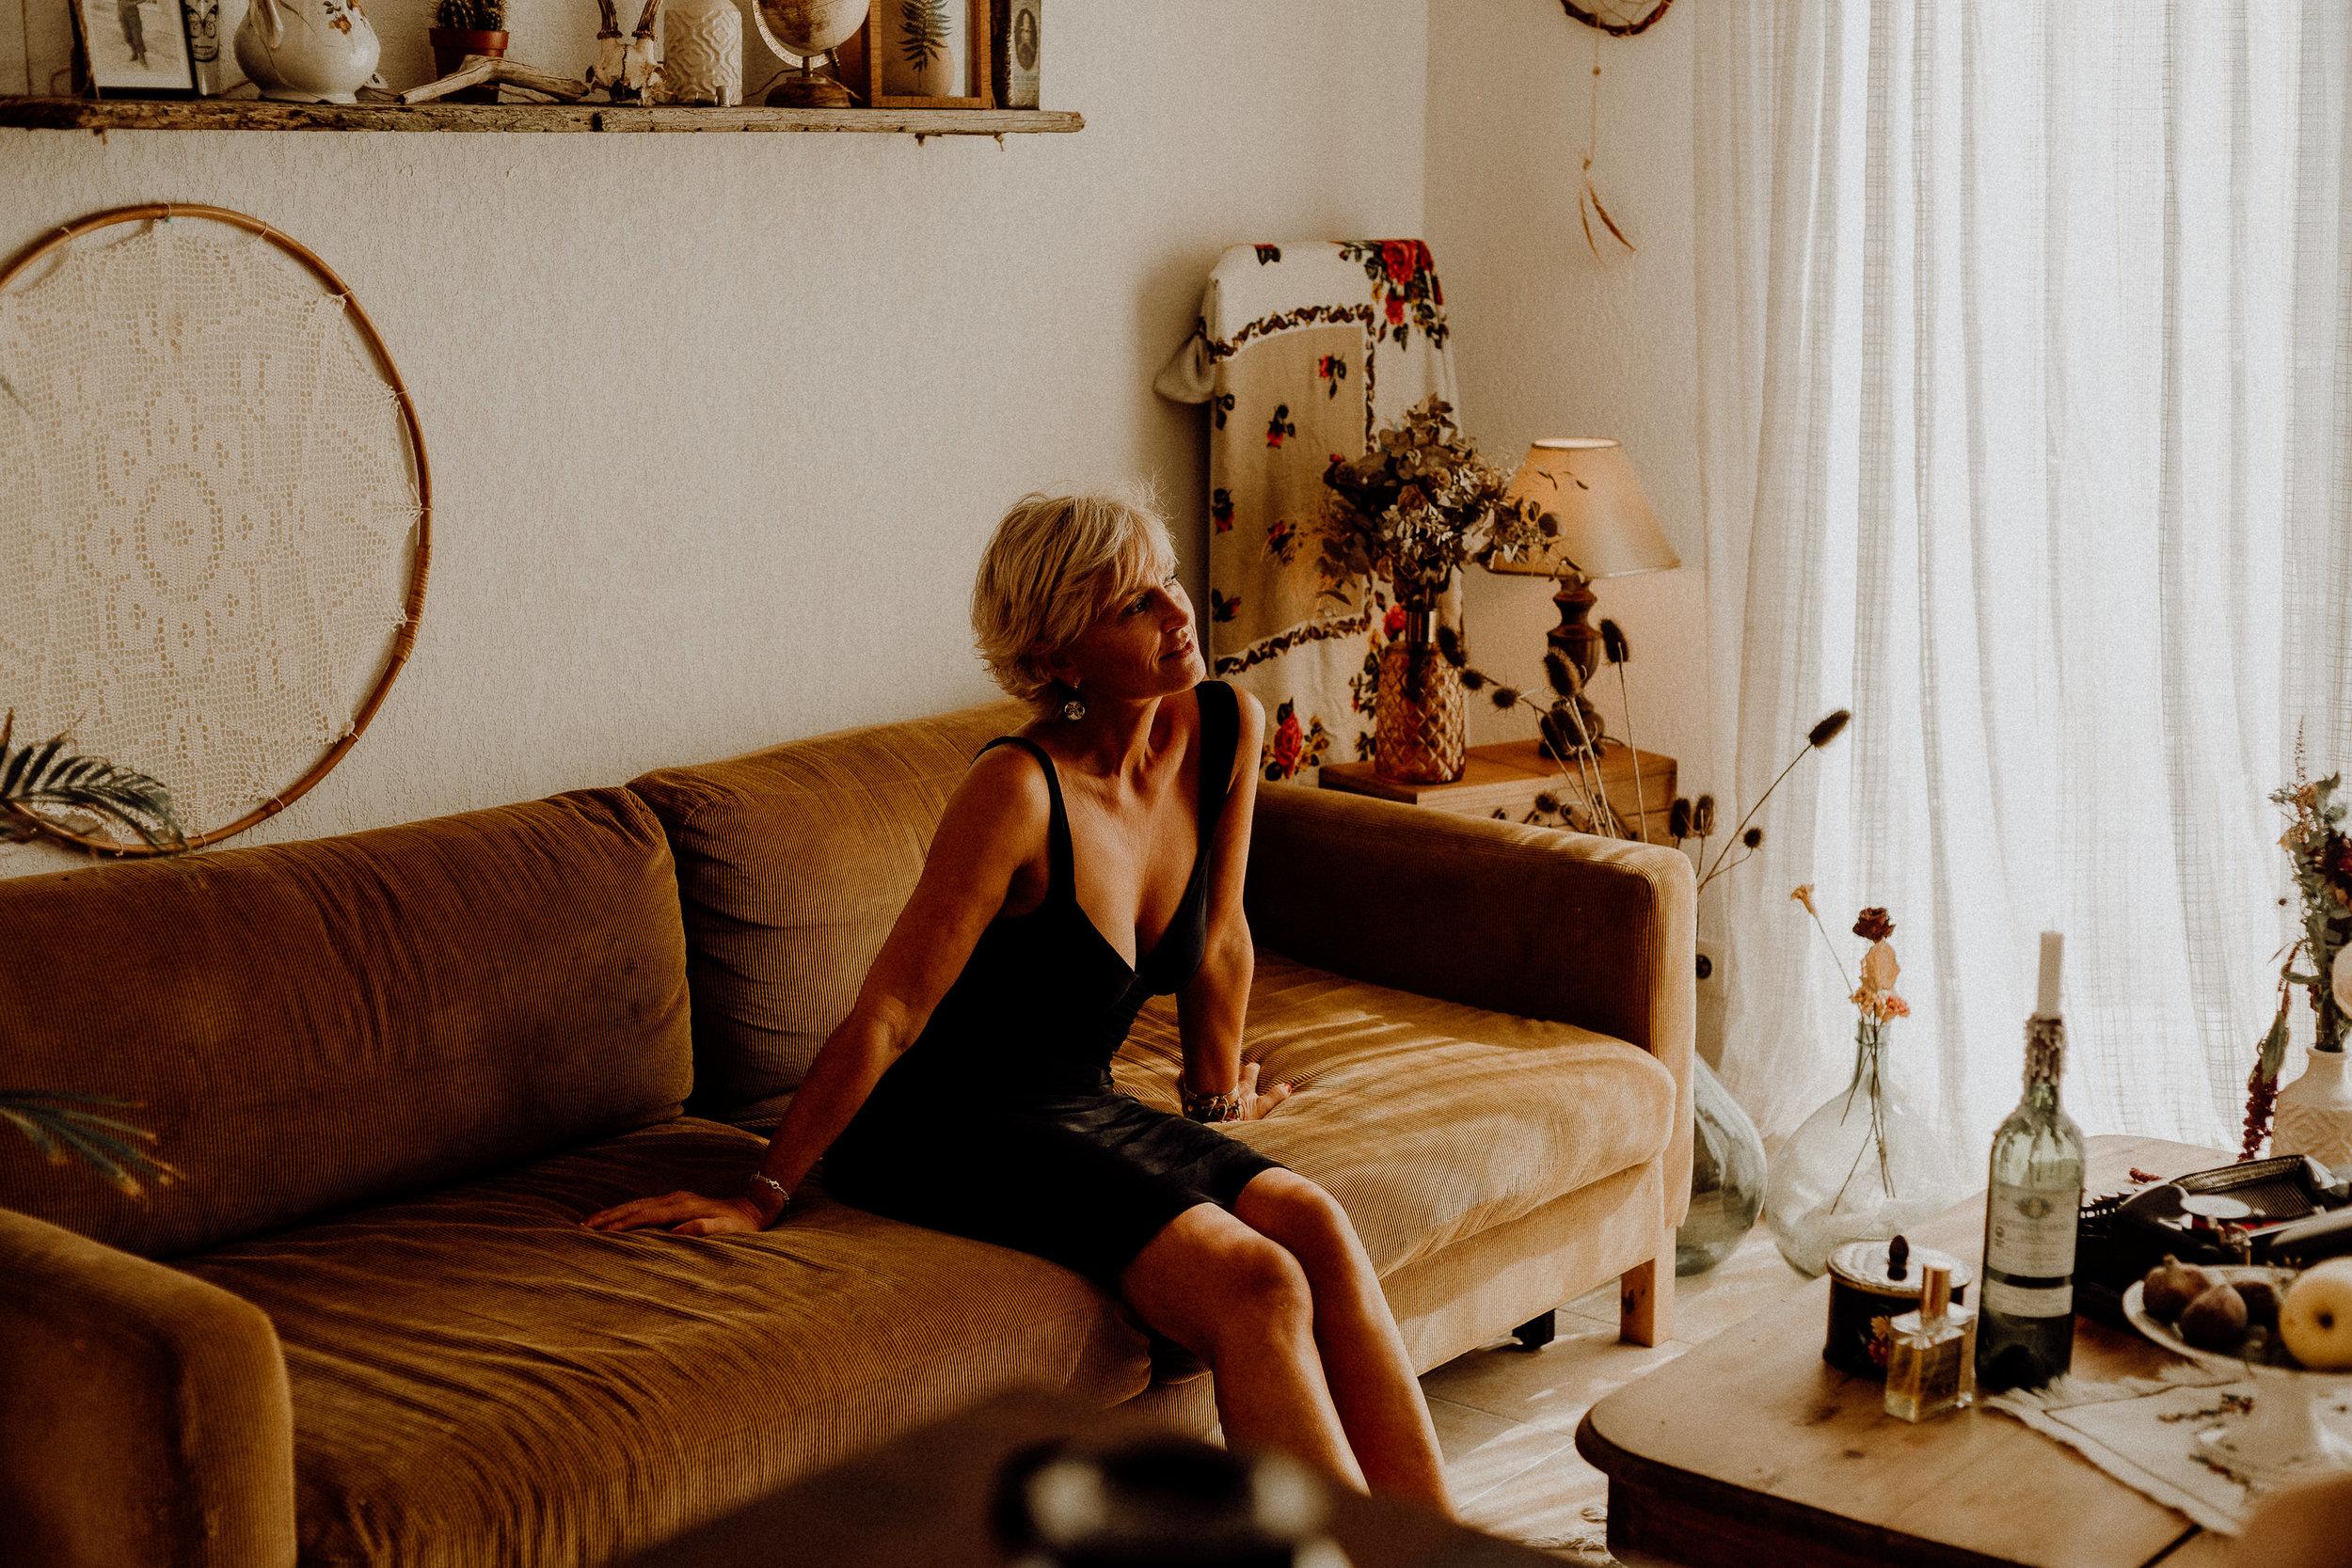 Christelle-azahar-style-www.kewin-connin-jackson.fr-205058.jpg